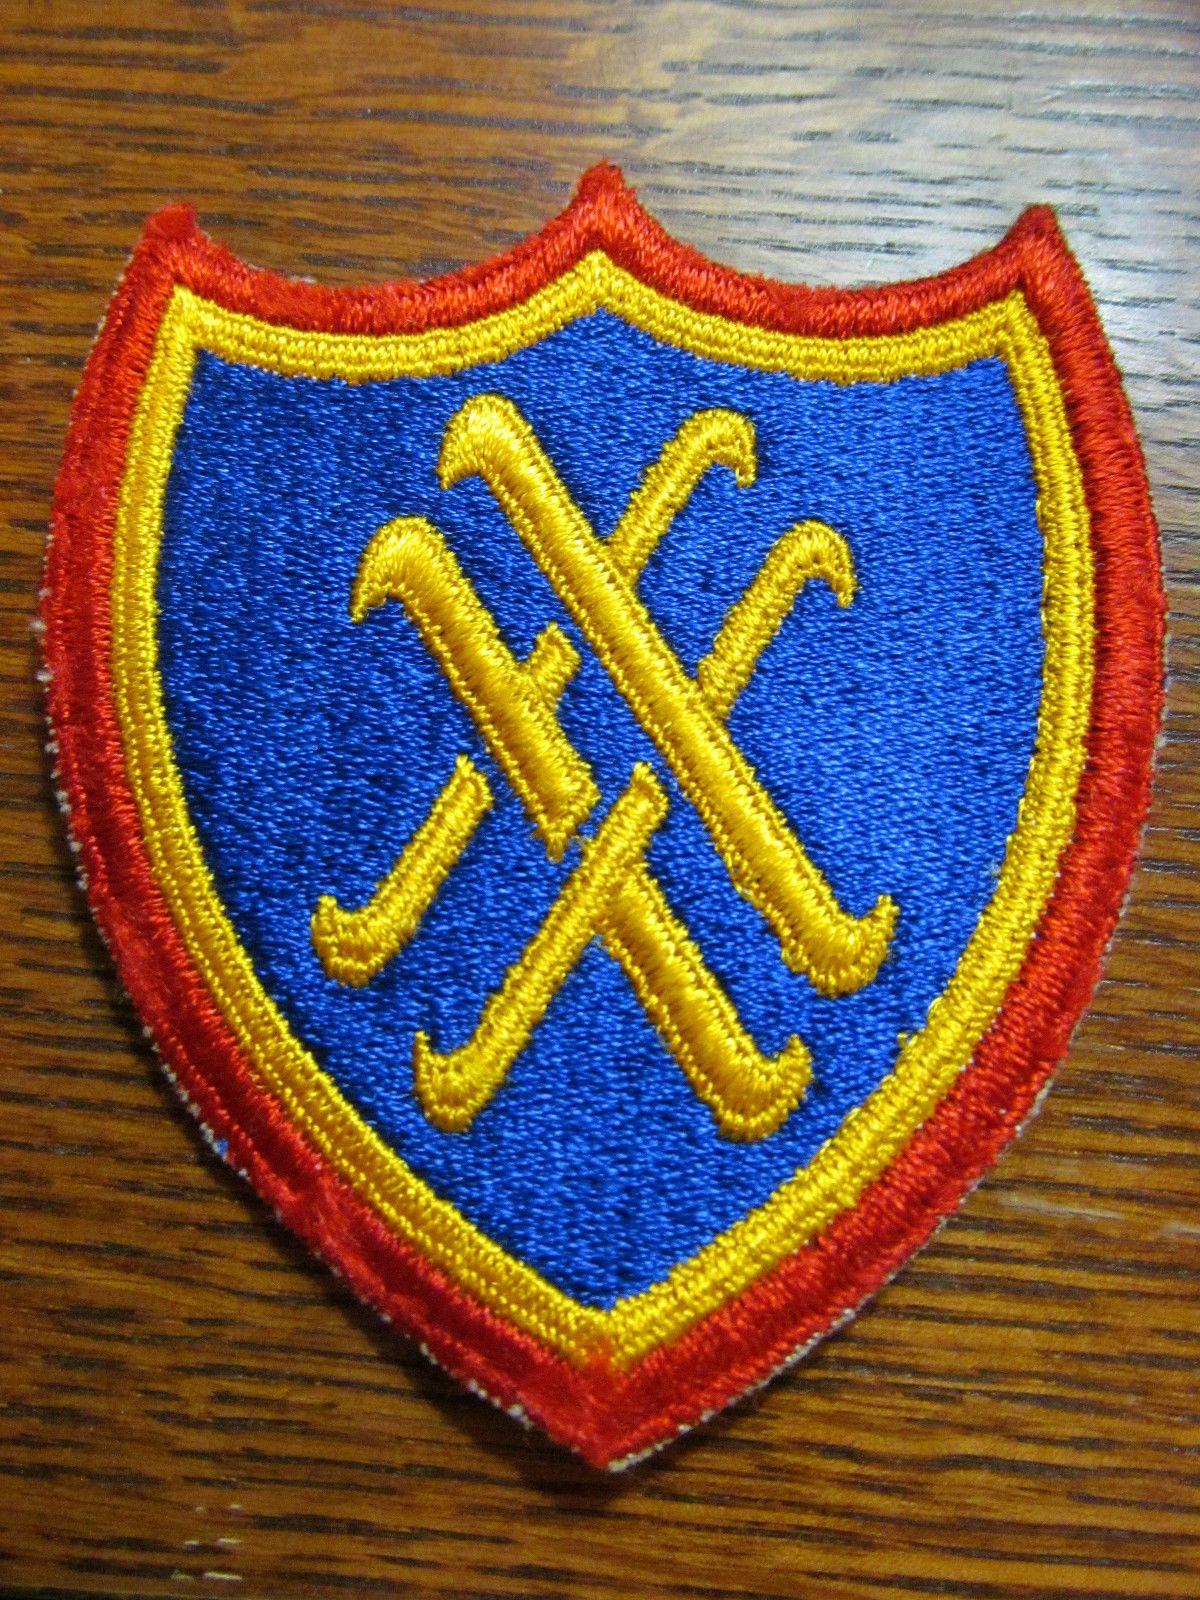 Original Wwii Ww2 Us Army Xx Corps 20th Khaki Cut Edge Shoulder Patch  Picclick